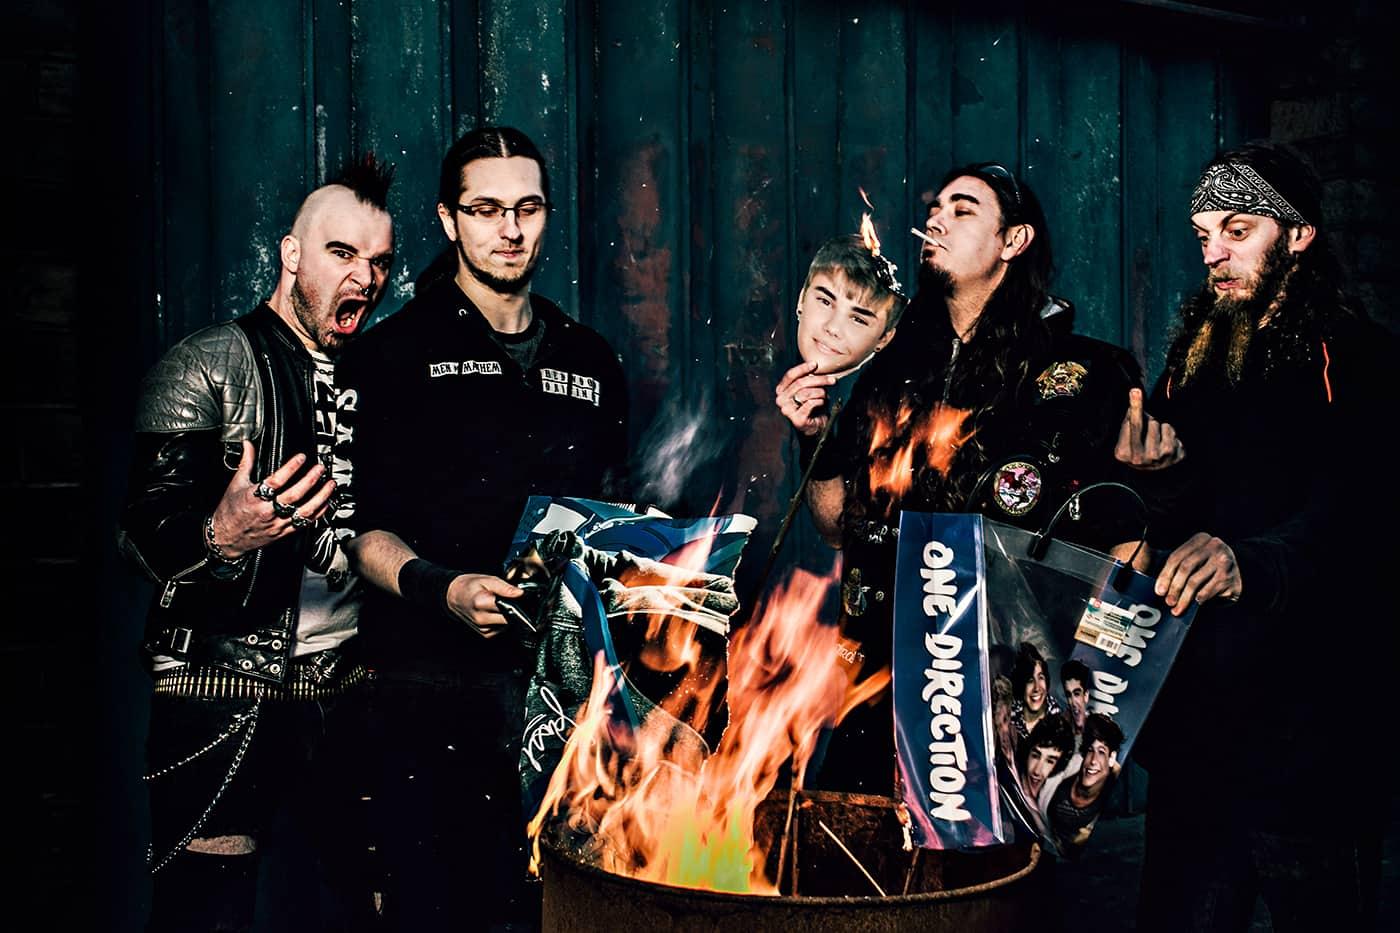 Evile band